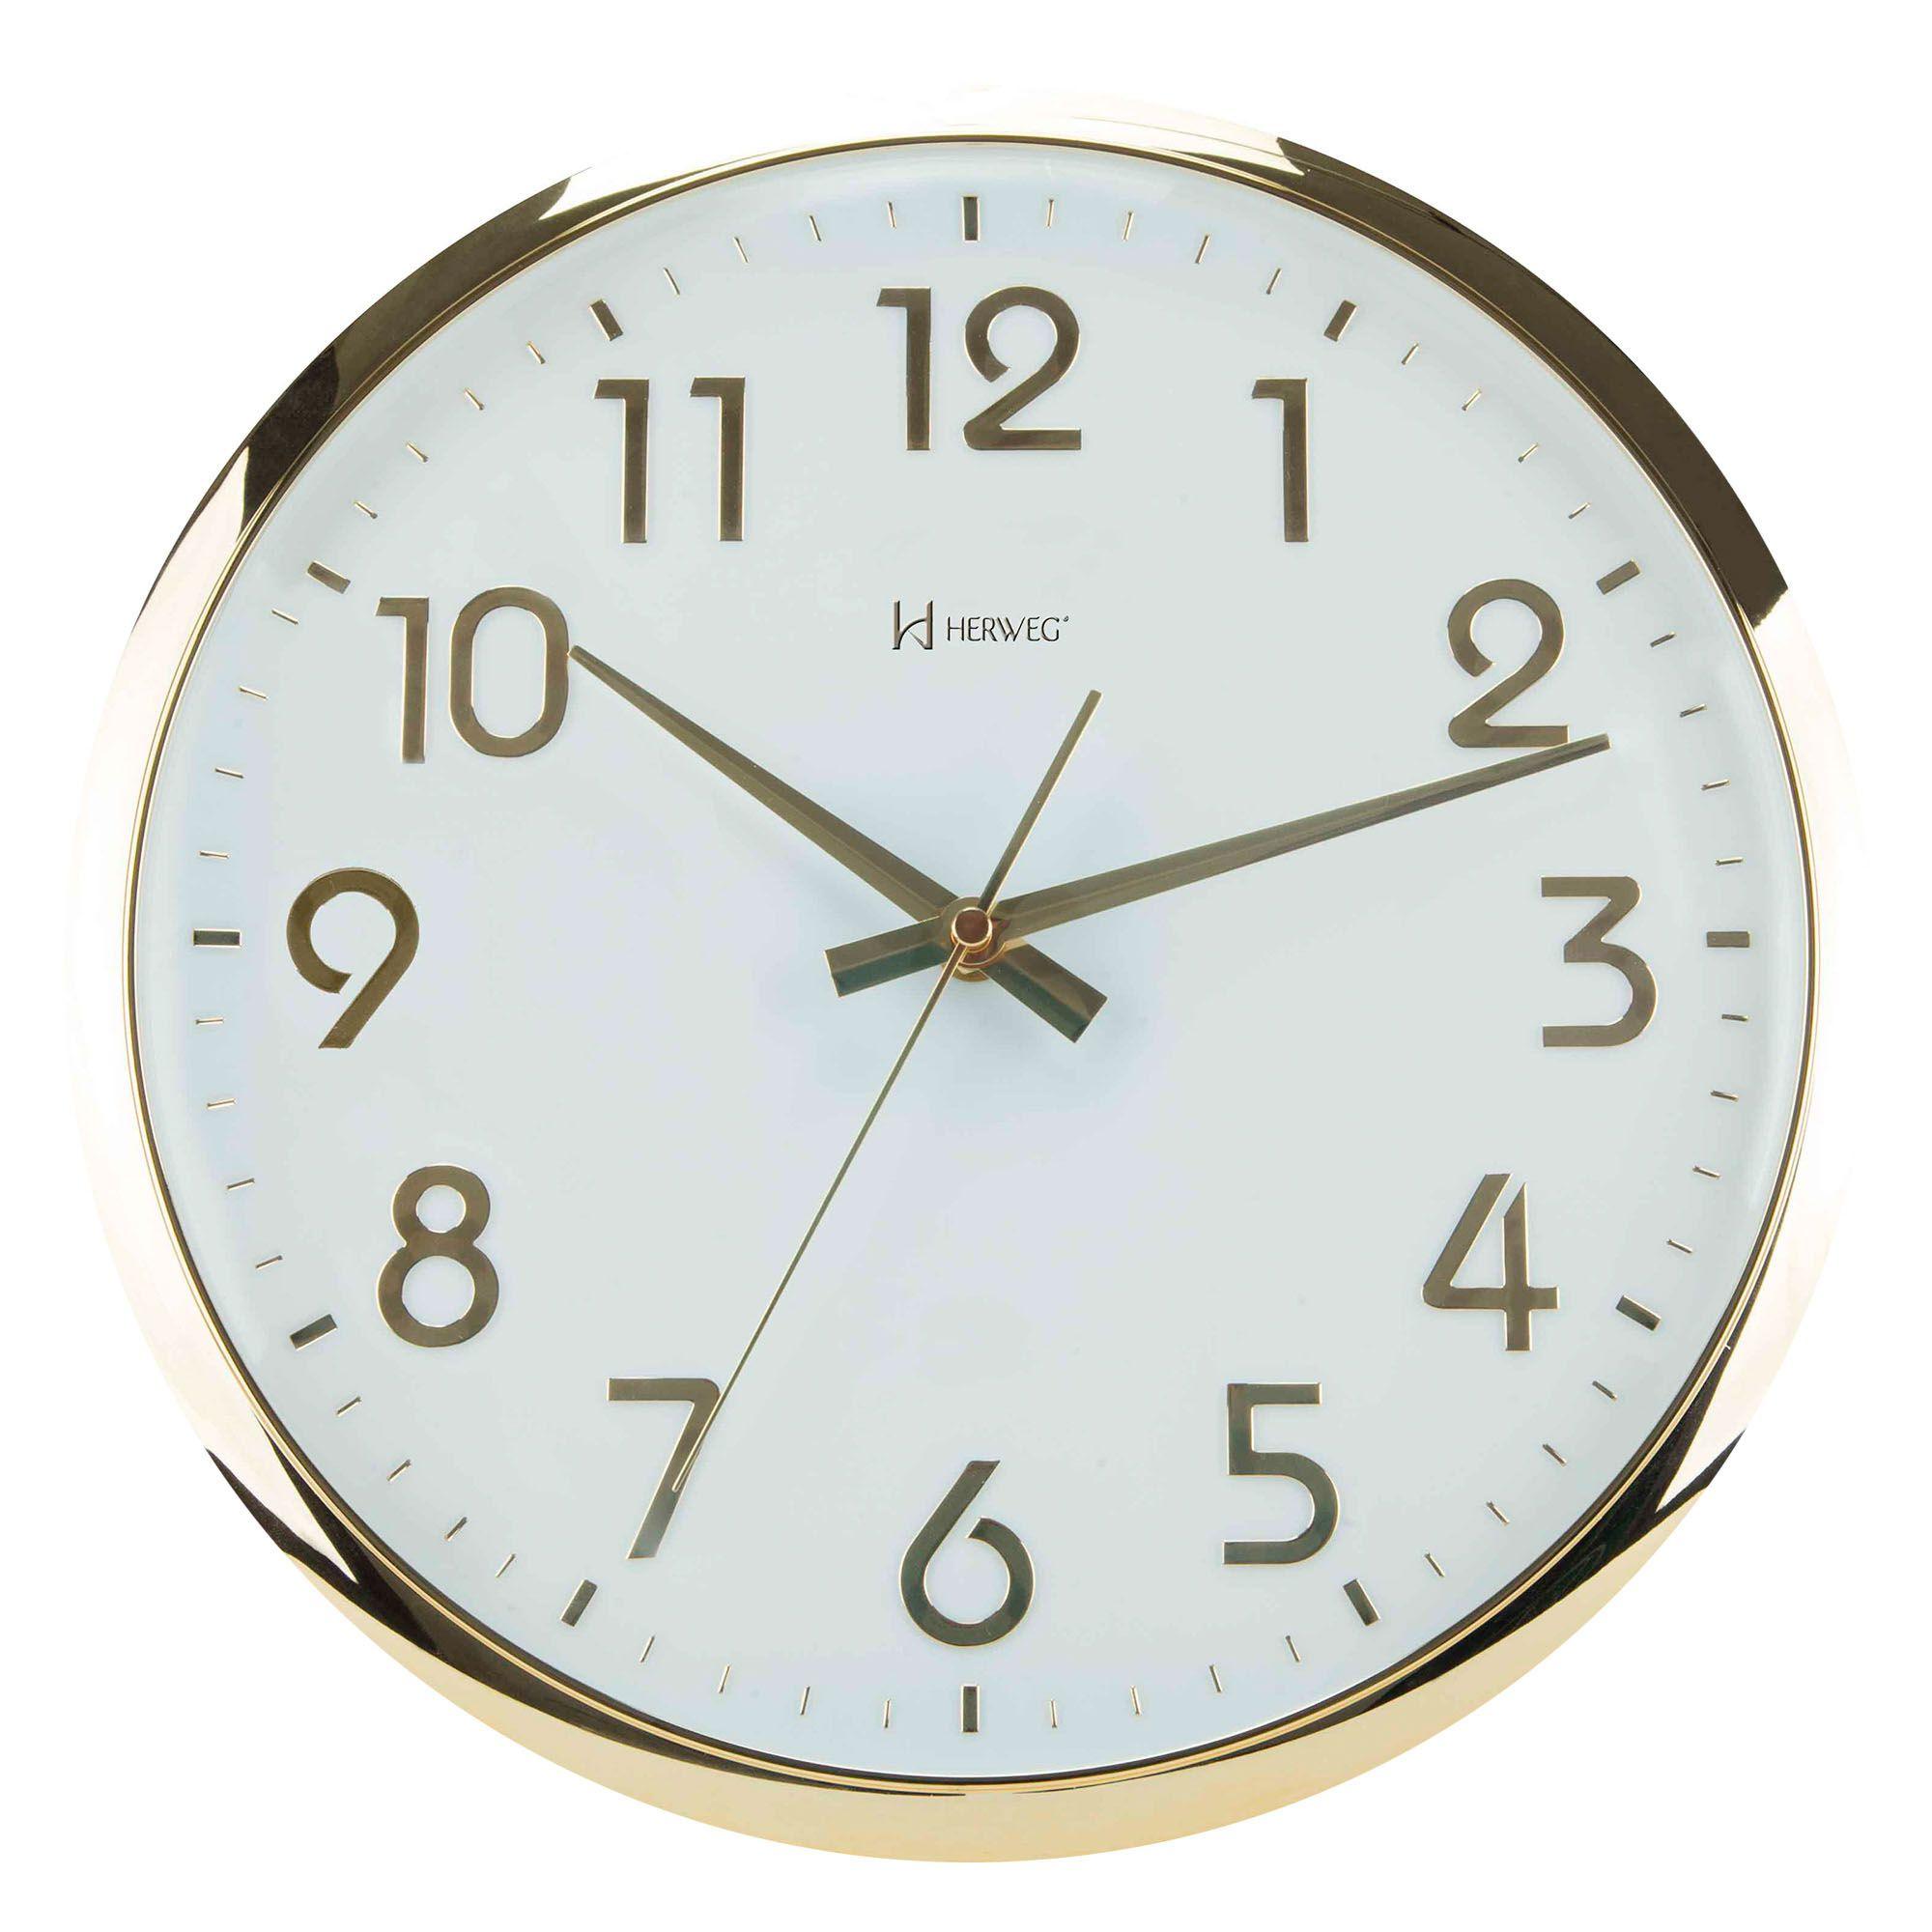 Relógio de Parede Analógico Herweg 6436 029 Dourado Claro